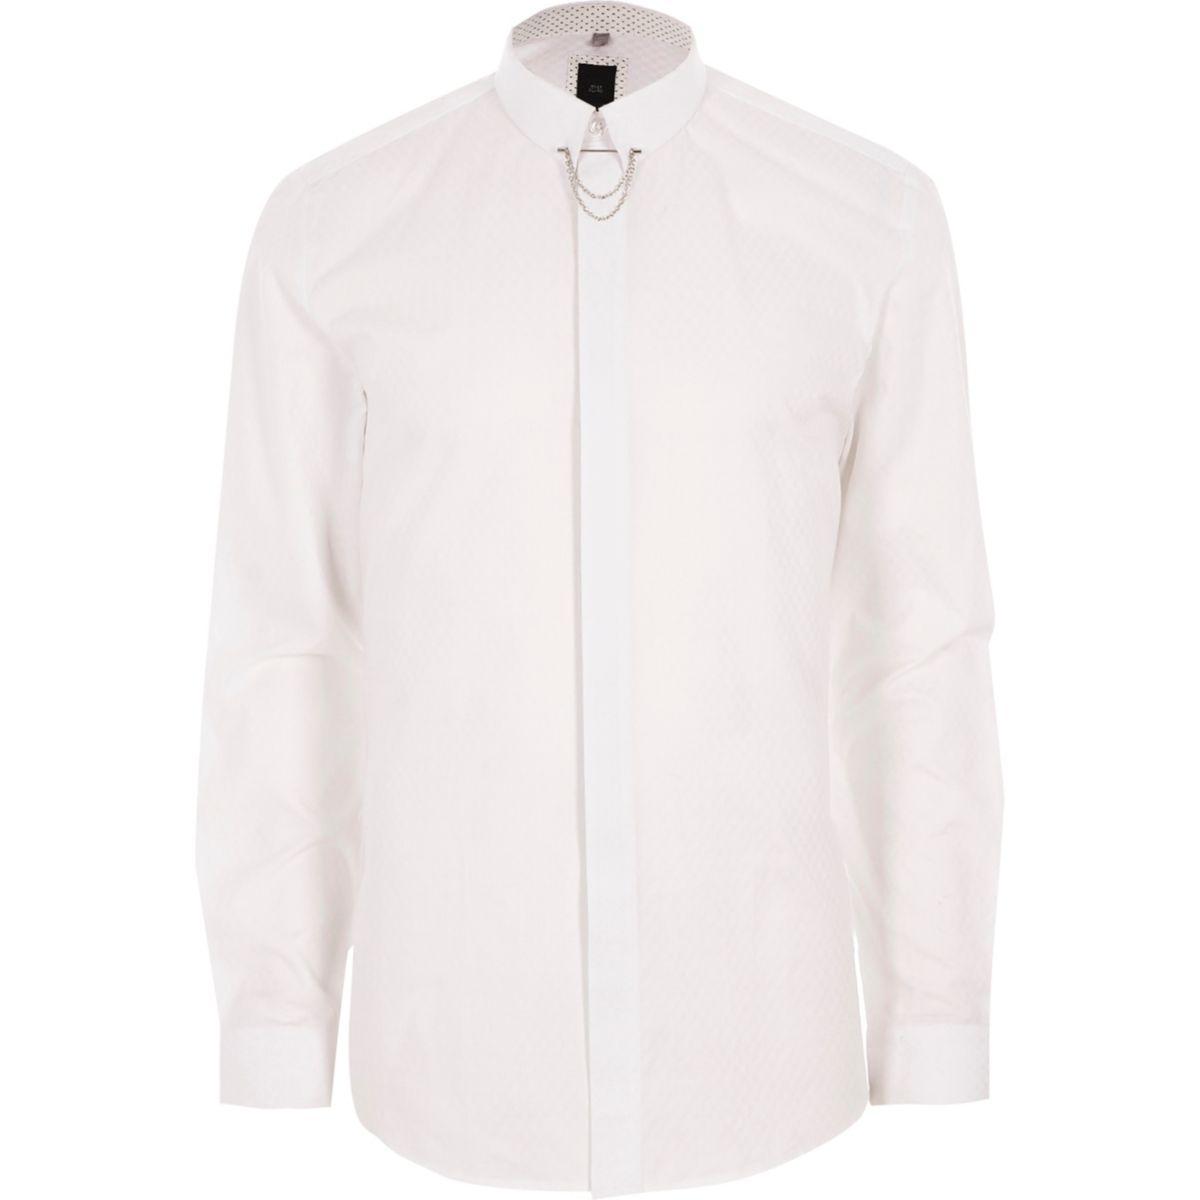 White jacquard collar chain slim fit shirt